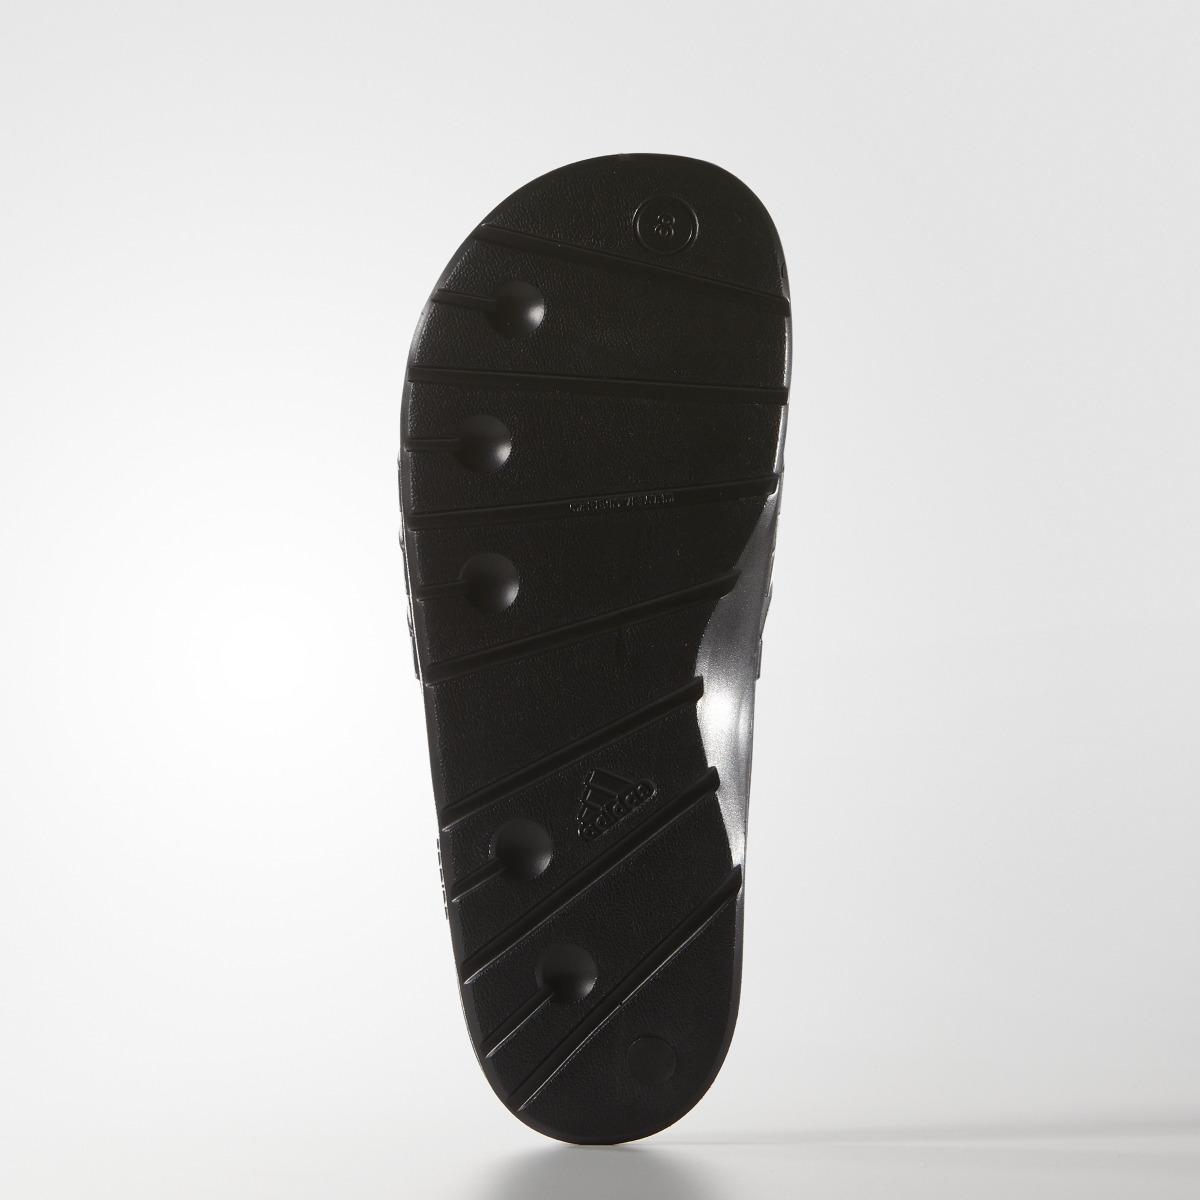 bb01c2545 Adidas - Black Duramo Unisex Swimming Sandals for Men - Lyst. View  fullscreen